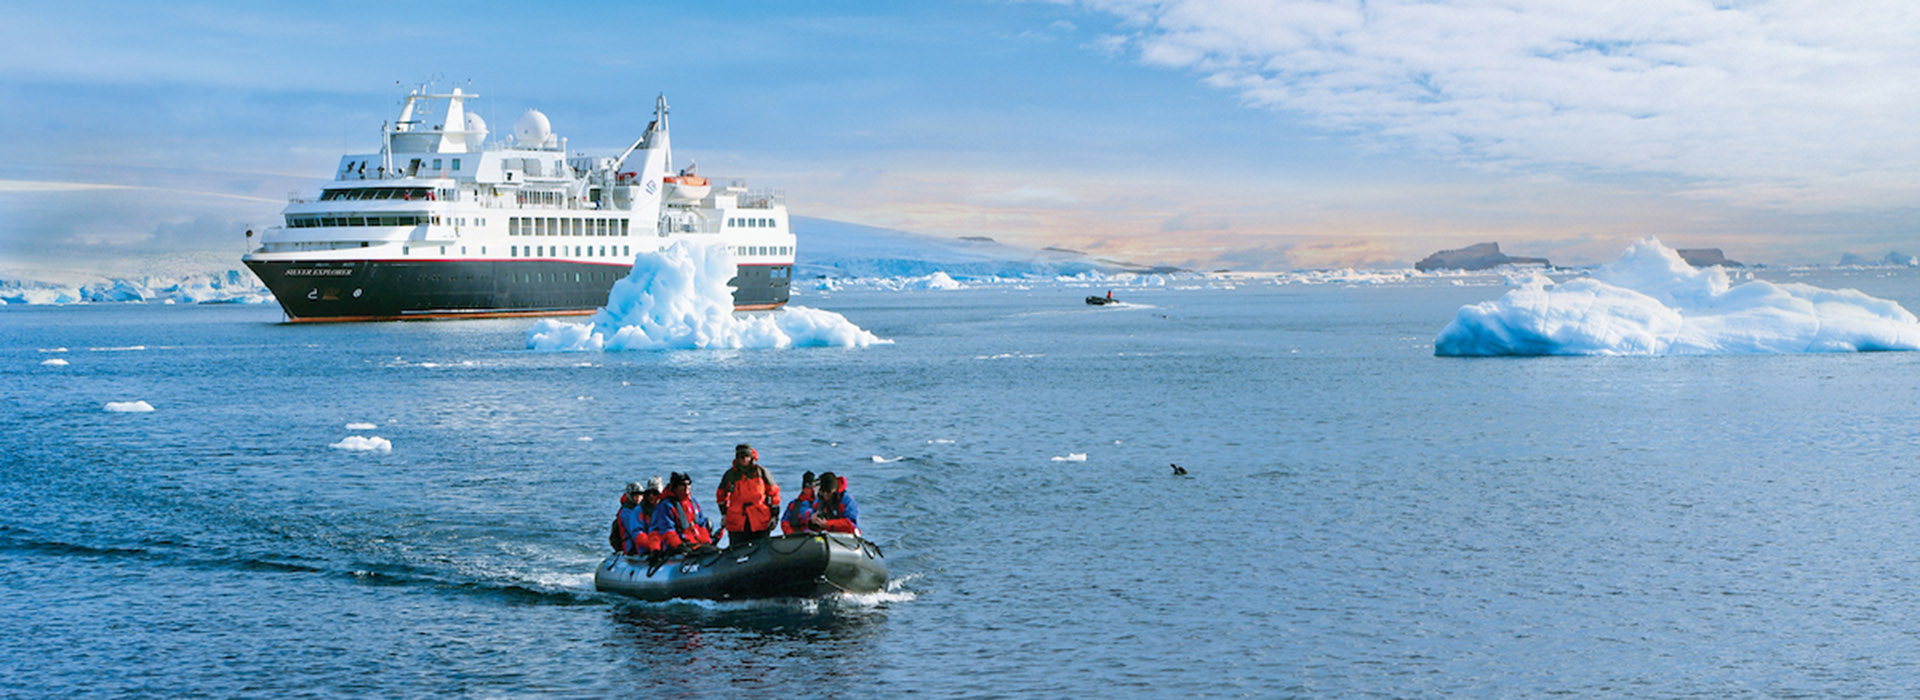 Silversea Luxusexpeditionsschiff